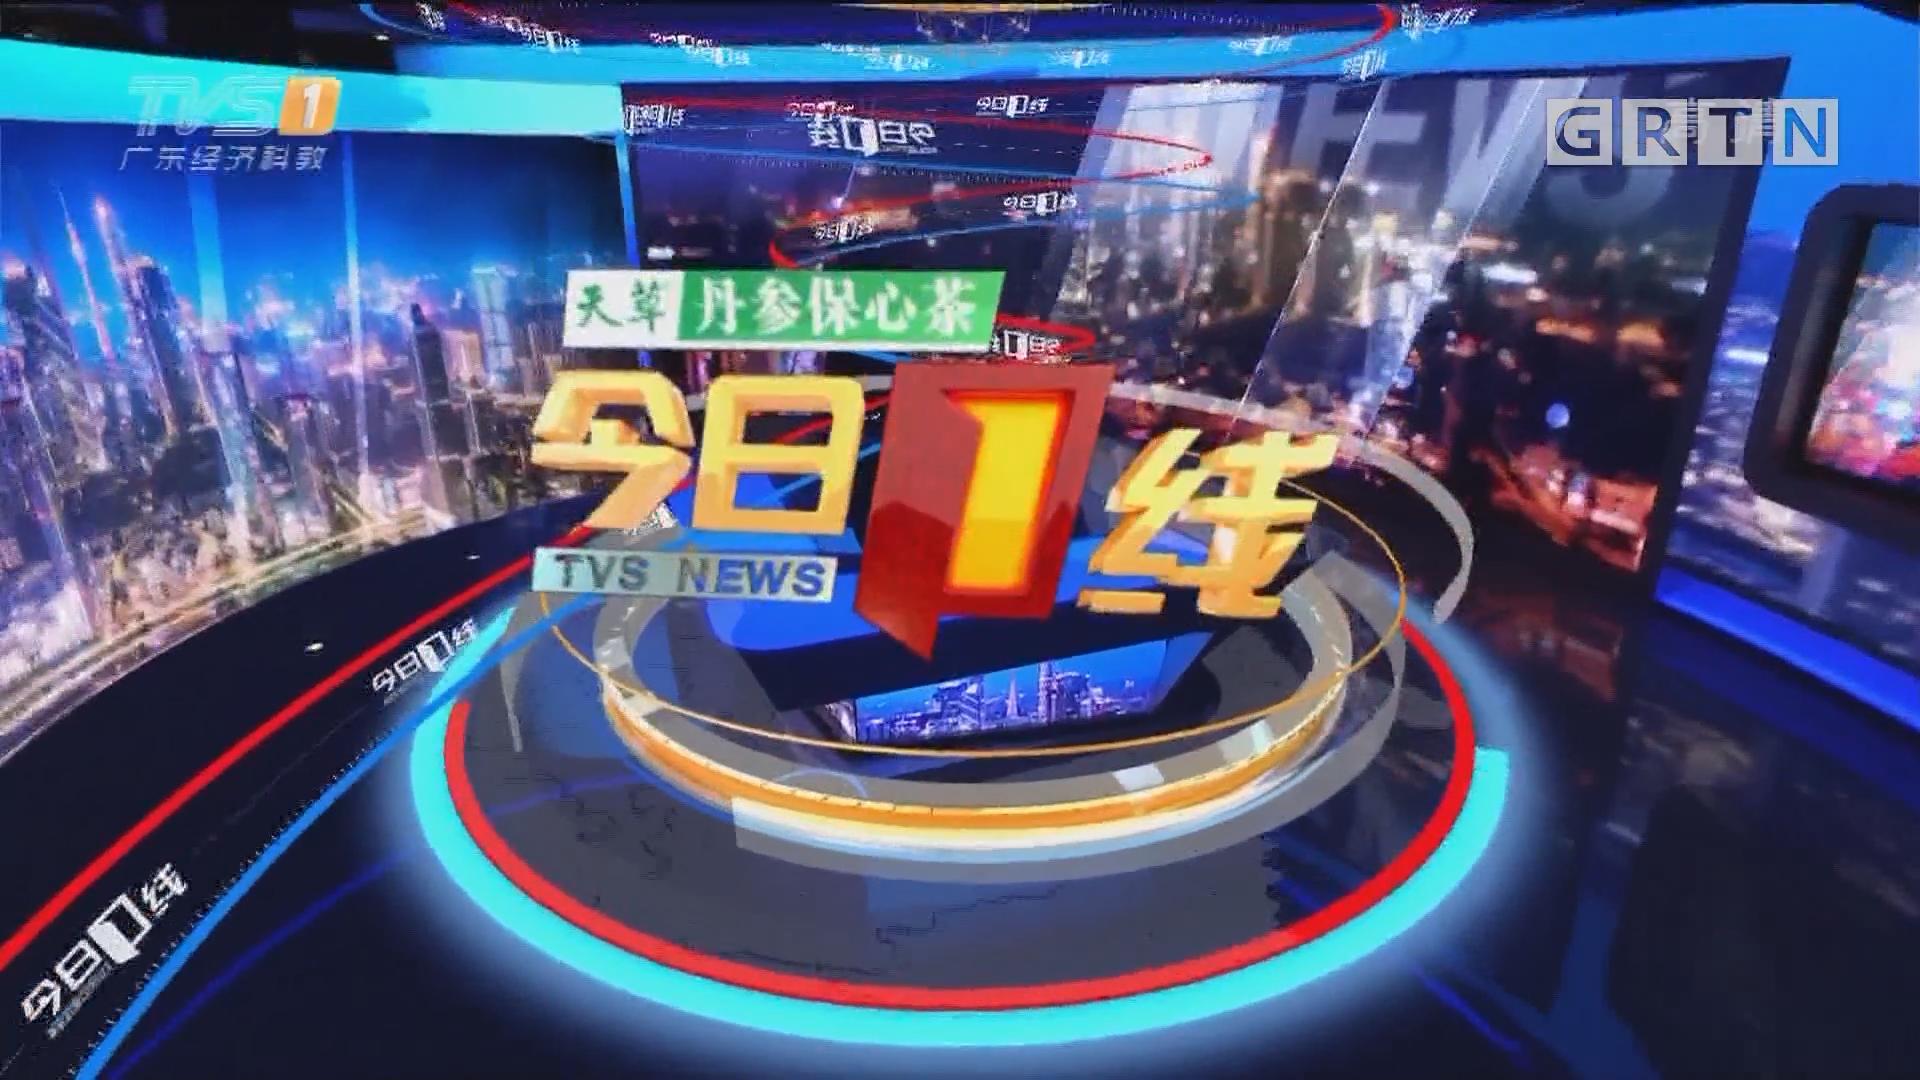 "[HD][2019-04-27]今日一线:关注强雷雨天气:暴雨倾盆 广州多路段""水浸街"""